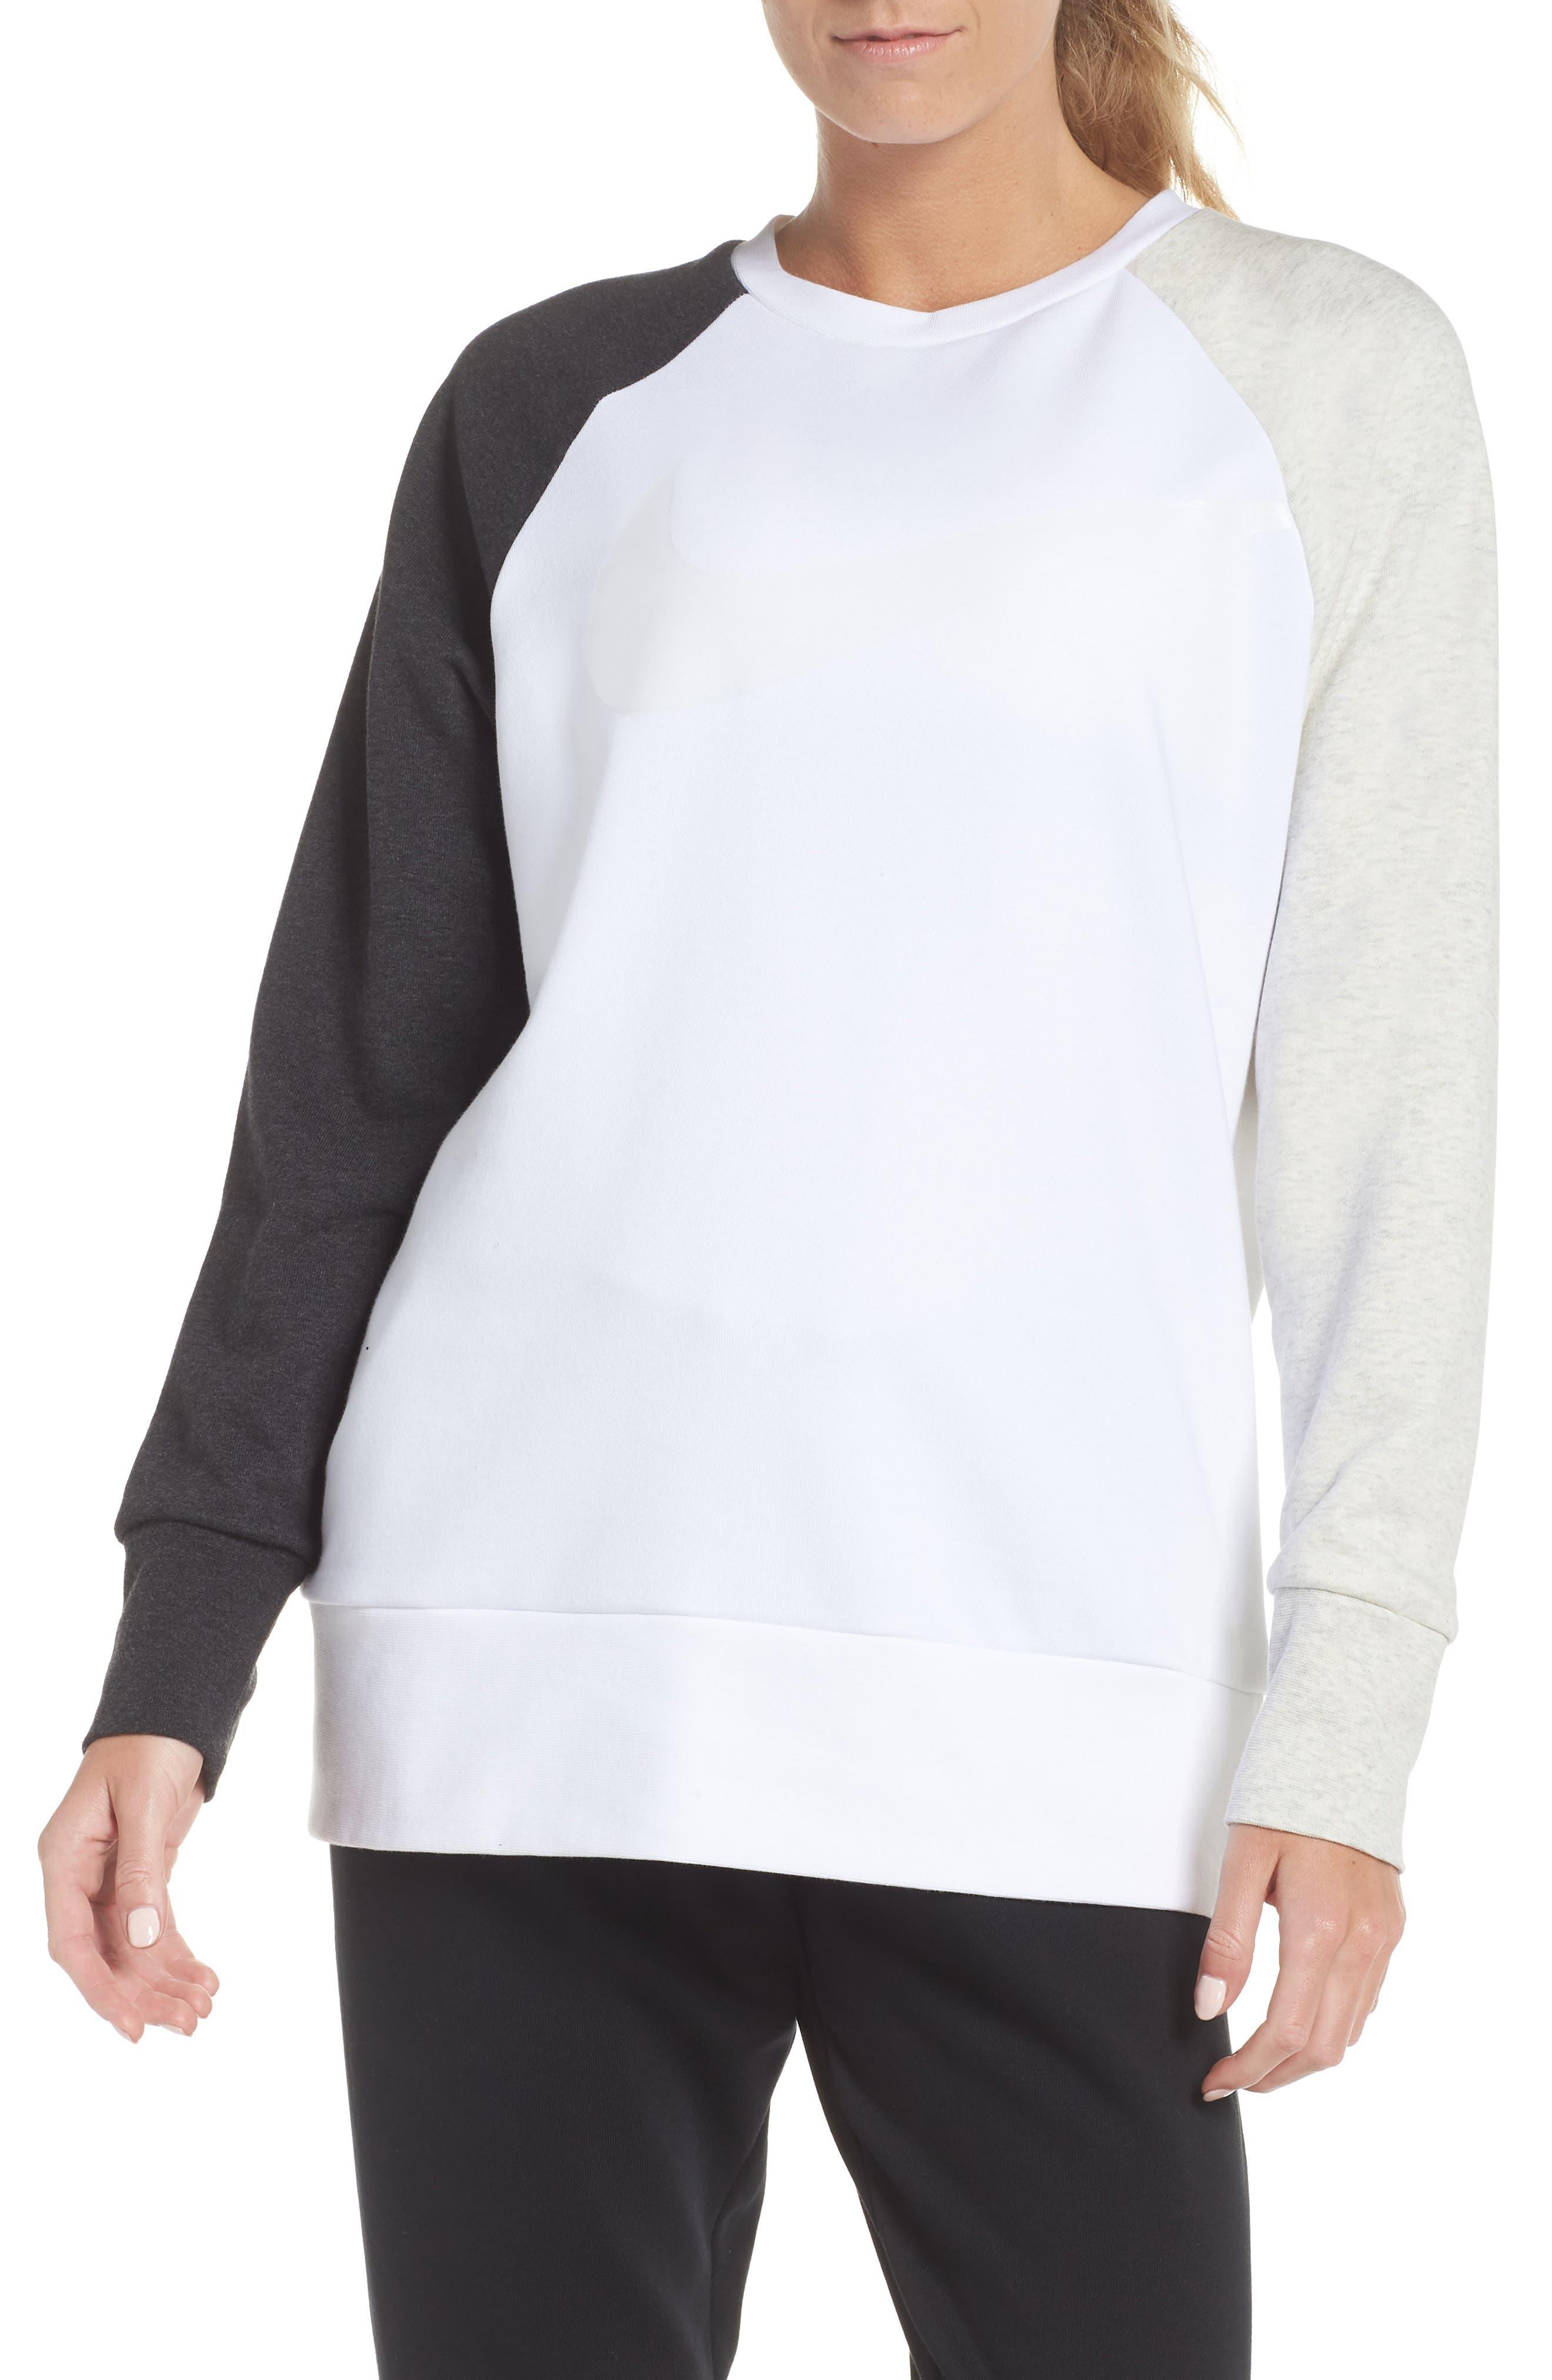 Dry Swoosh Sweatshirt,                         Main,                         color, WHITE/ BLACK HEATHER/ WHITE